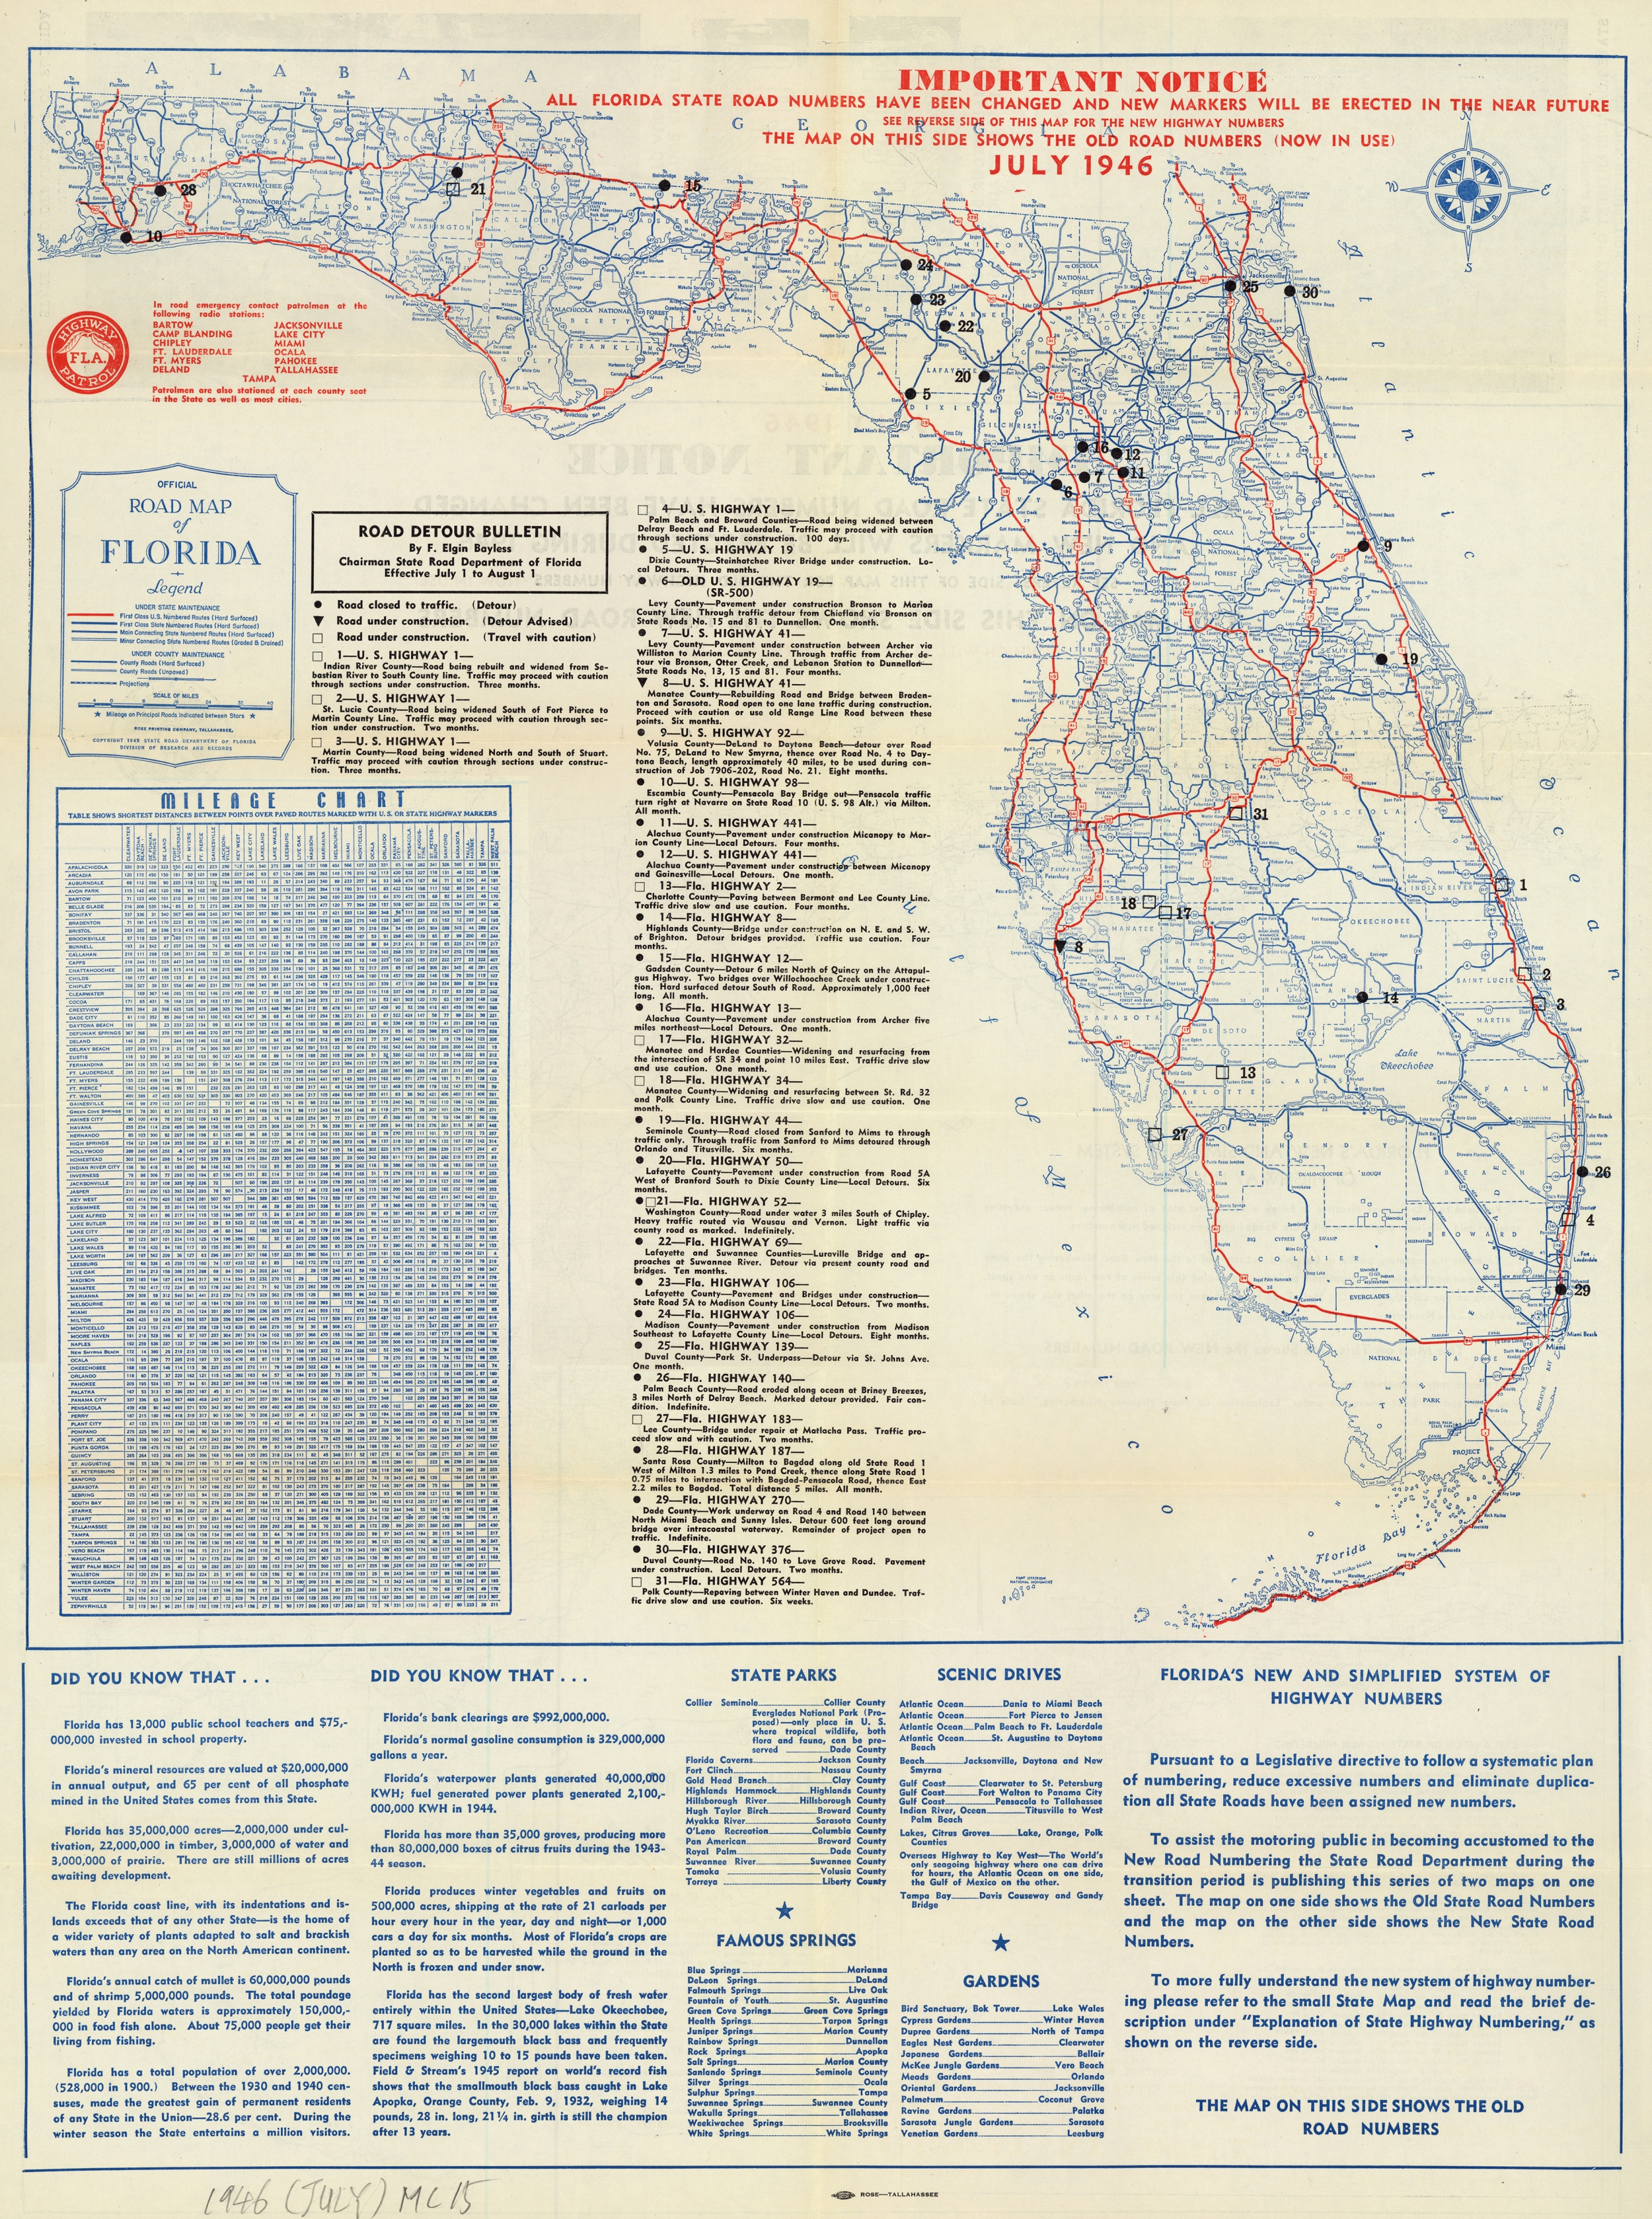 Florida Memory - Official Road Map Of Florida, 1946 - Lake Alfred Florida Map